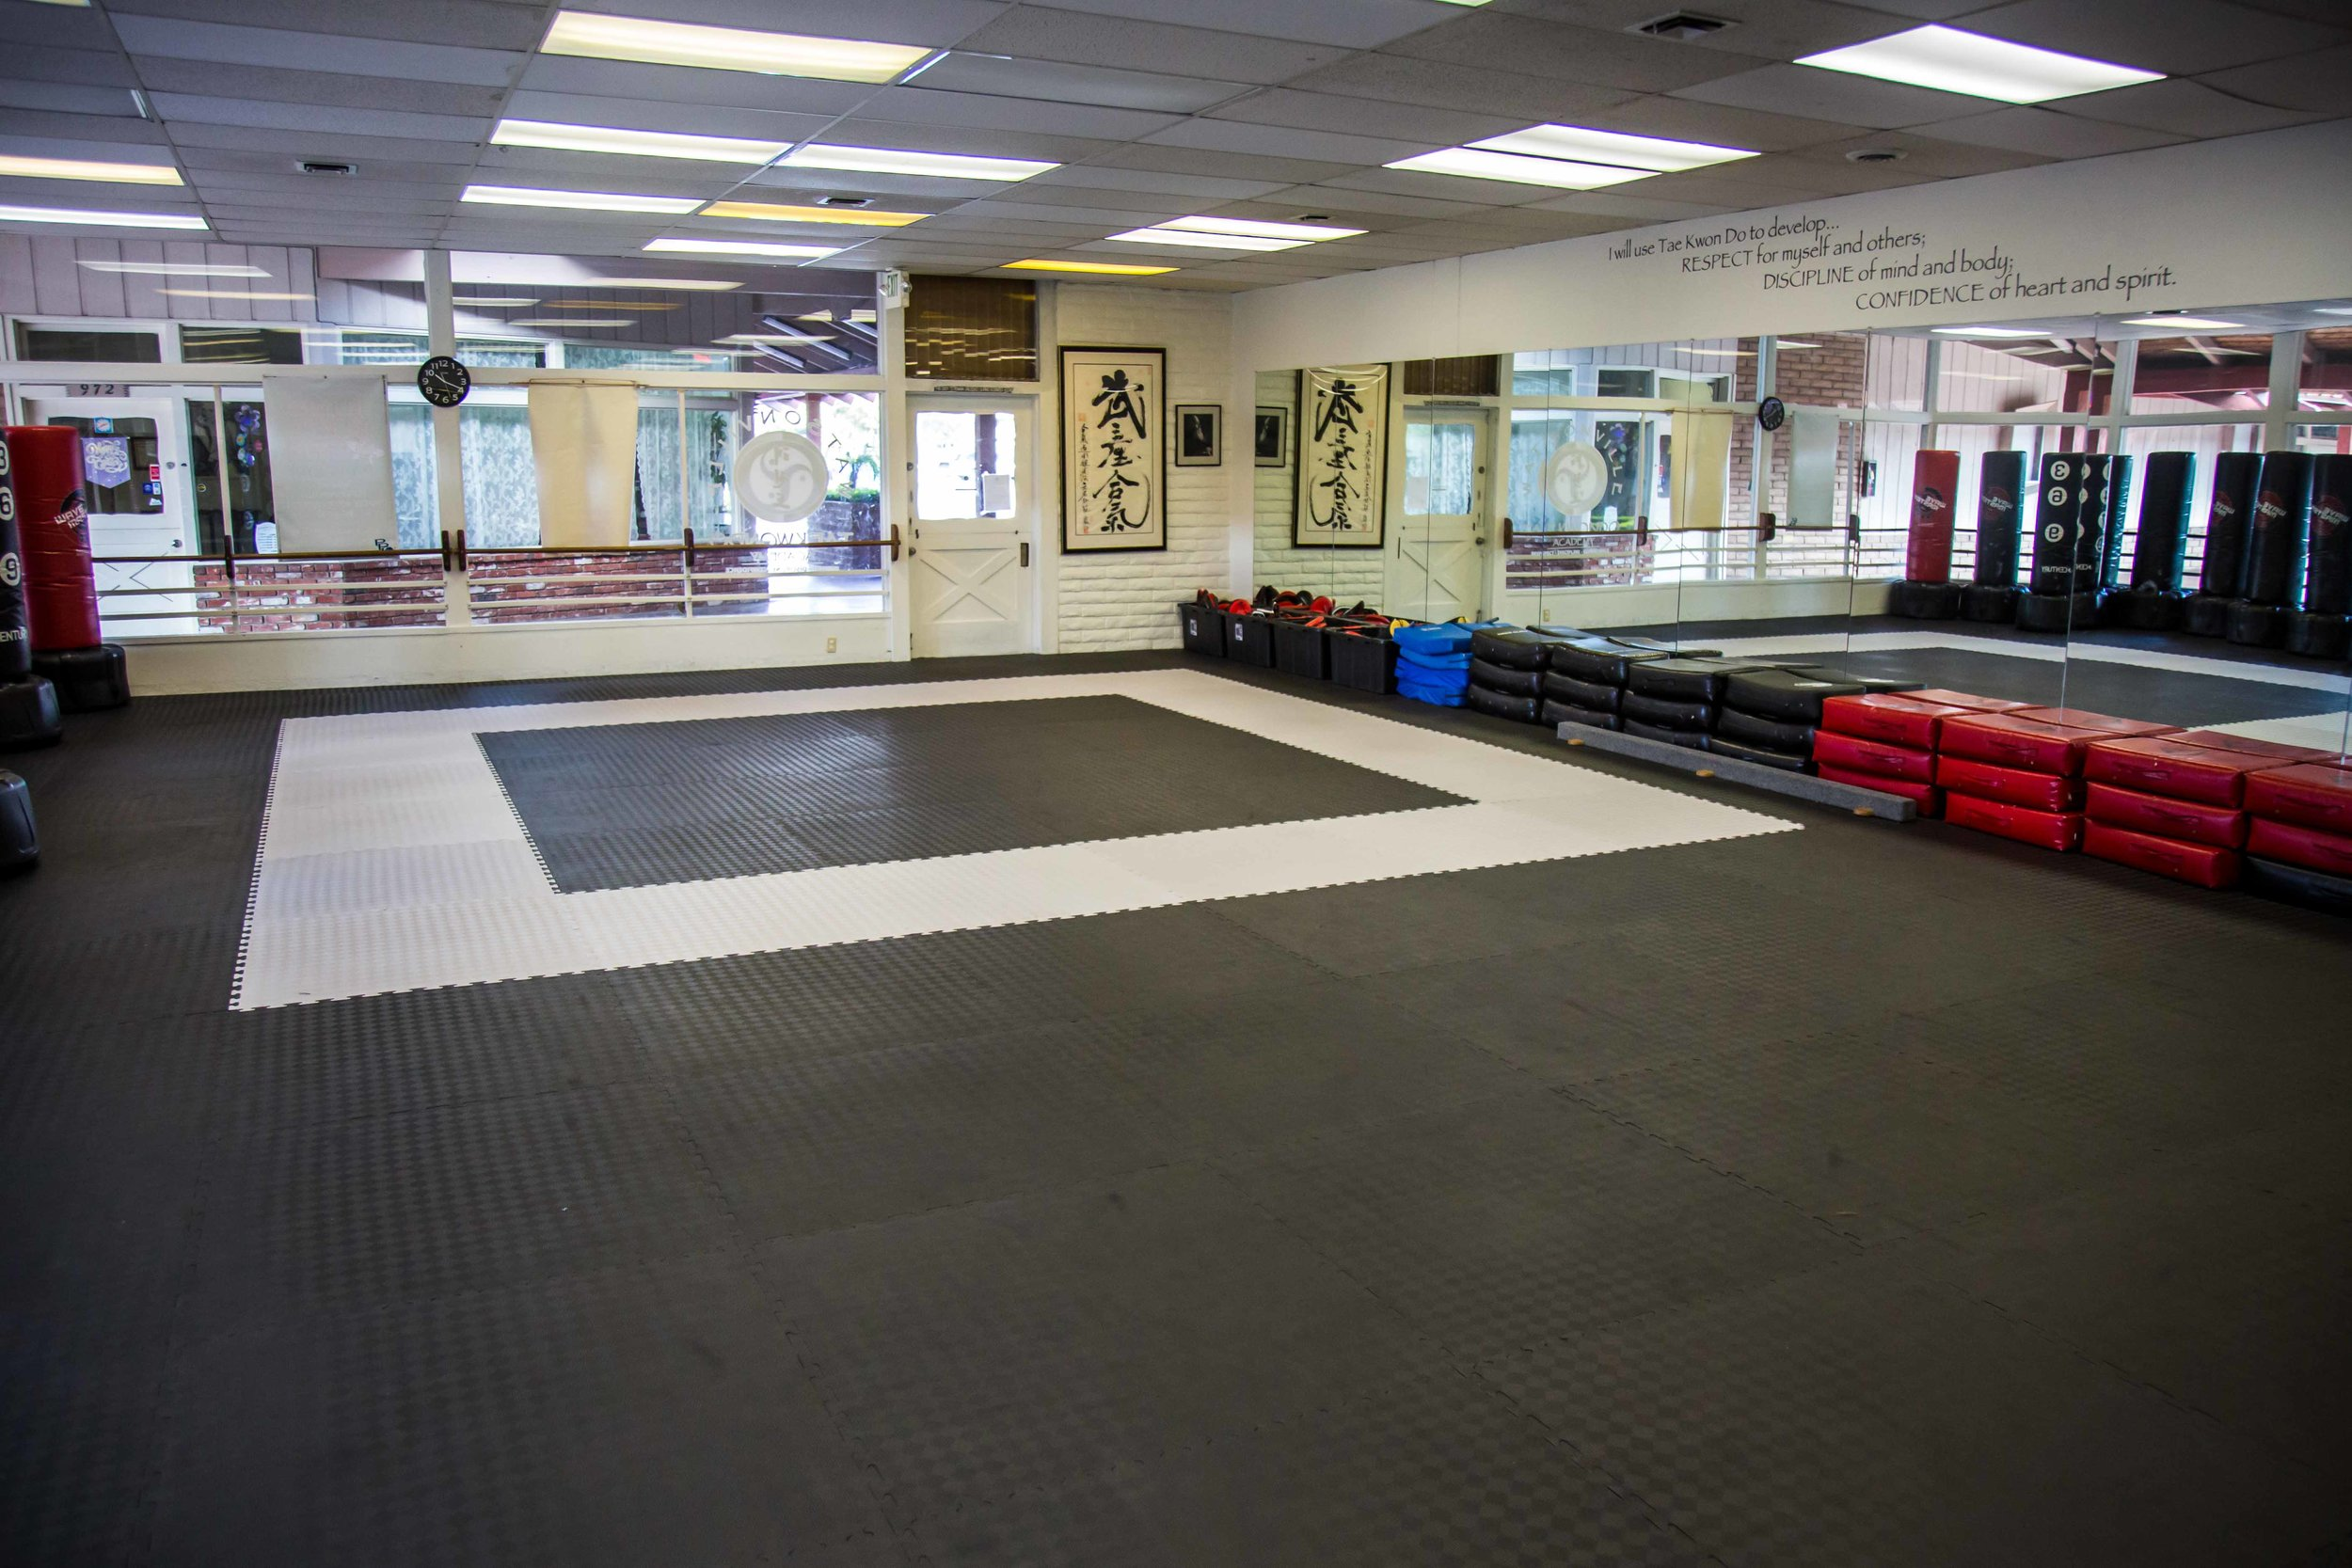 Watsonville Tae Kwon Do Academy   962 East Lake Ave. Watsonville, CA 95076  (831)722-0963   Follow on:  Facebook